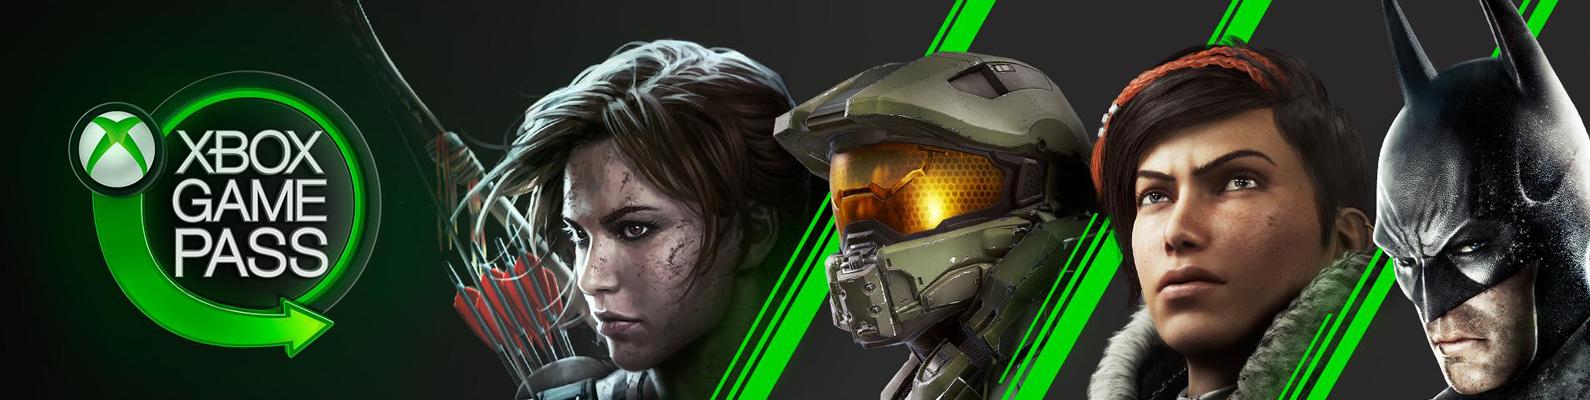 Приставки Xbox - подписки/пополнение бумажника